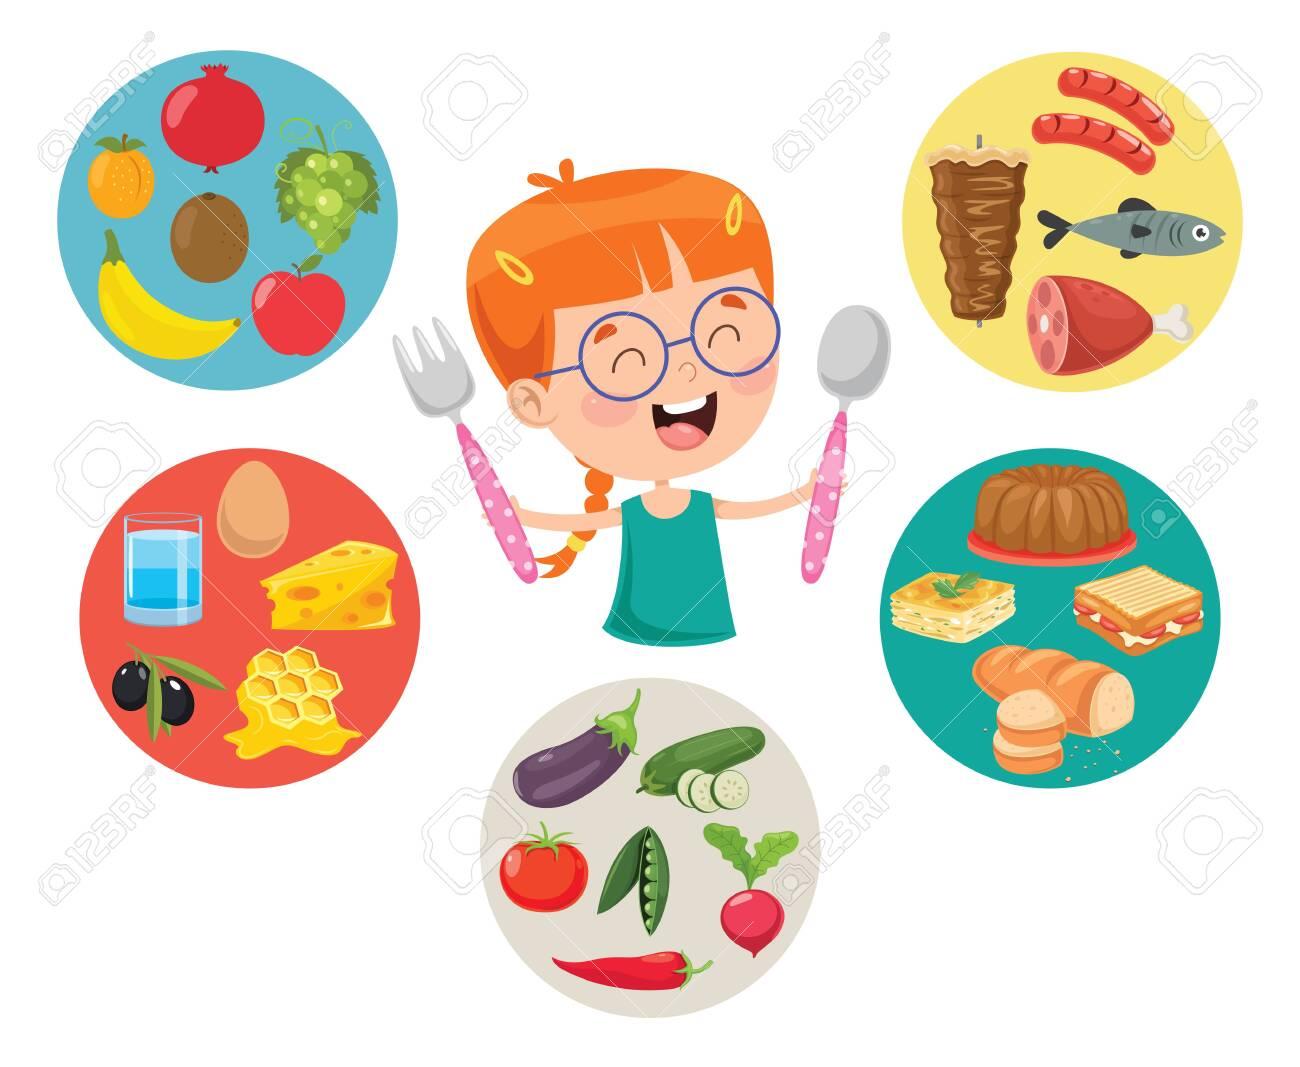 Vector Illustration Of Children Food Concept - 122323642